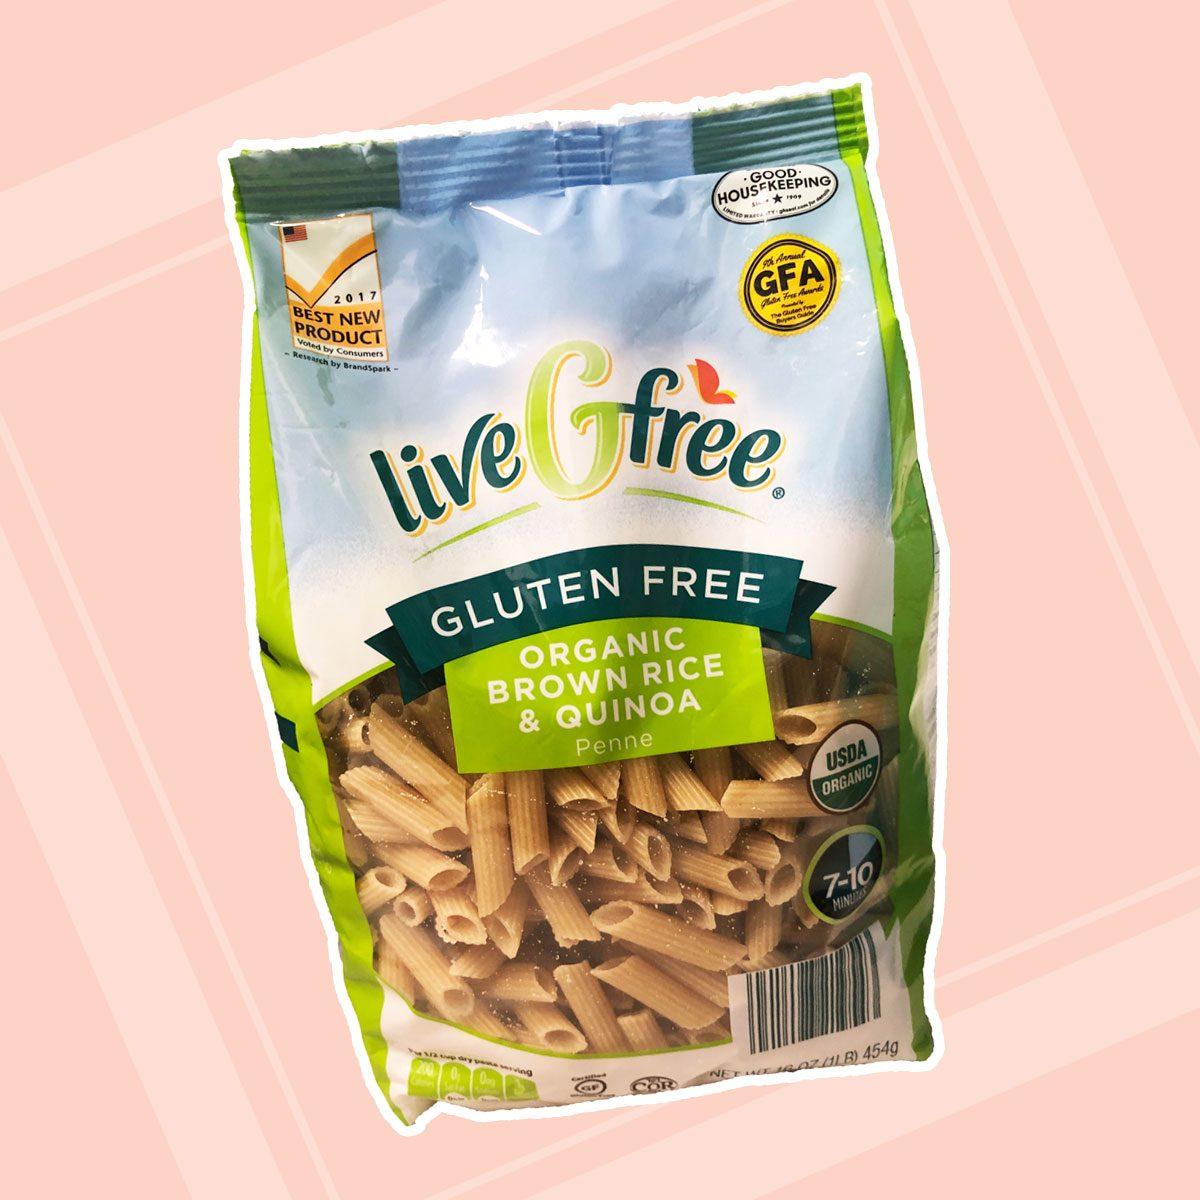 LiveGFree Pasta